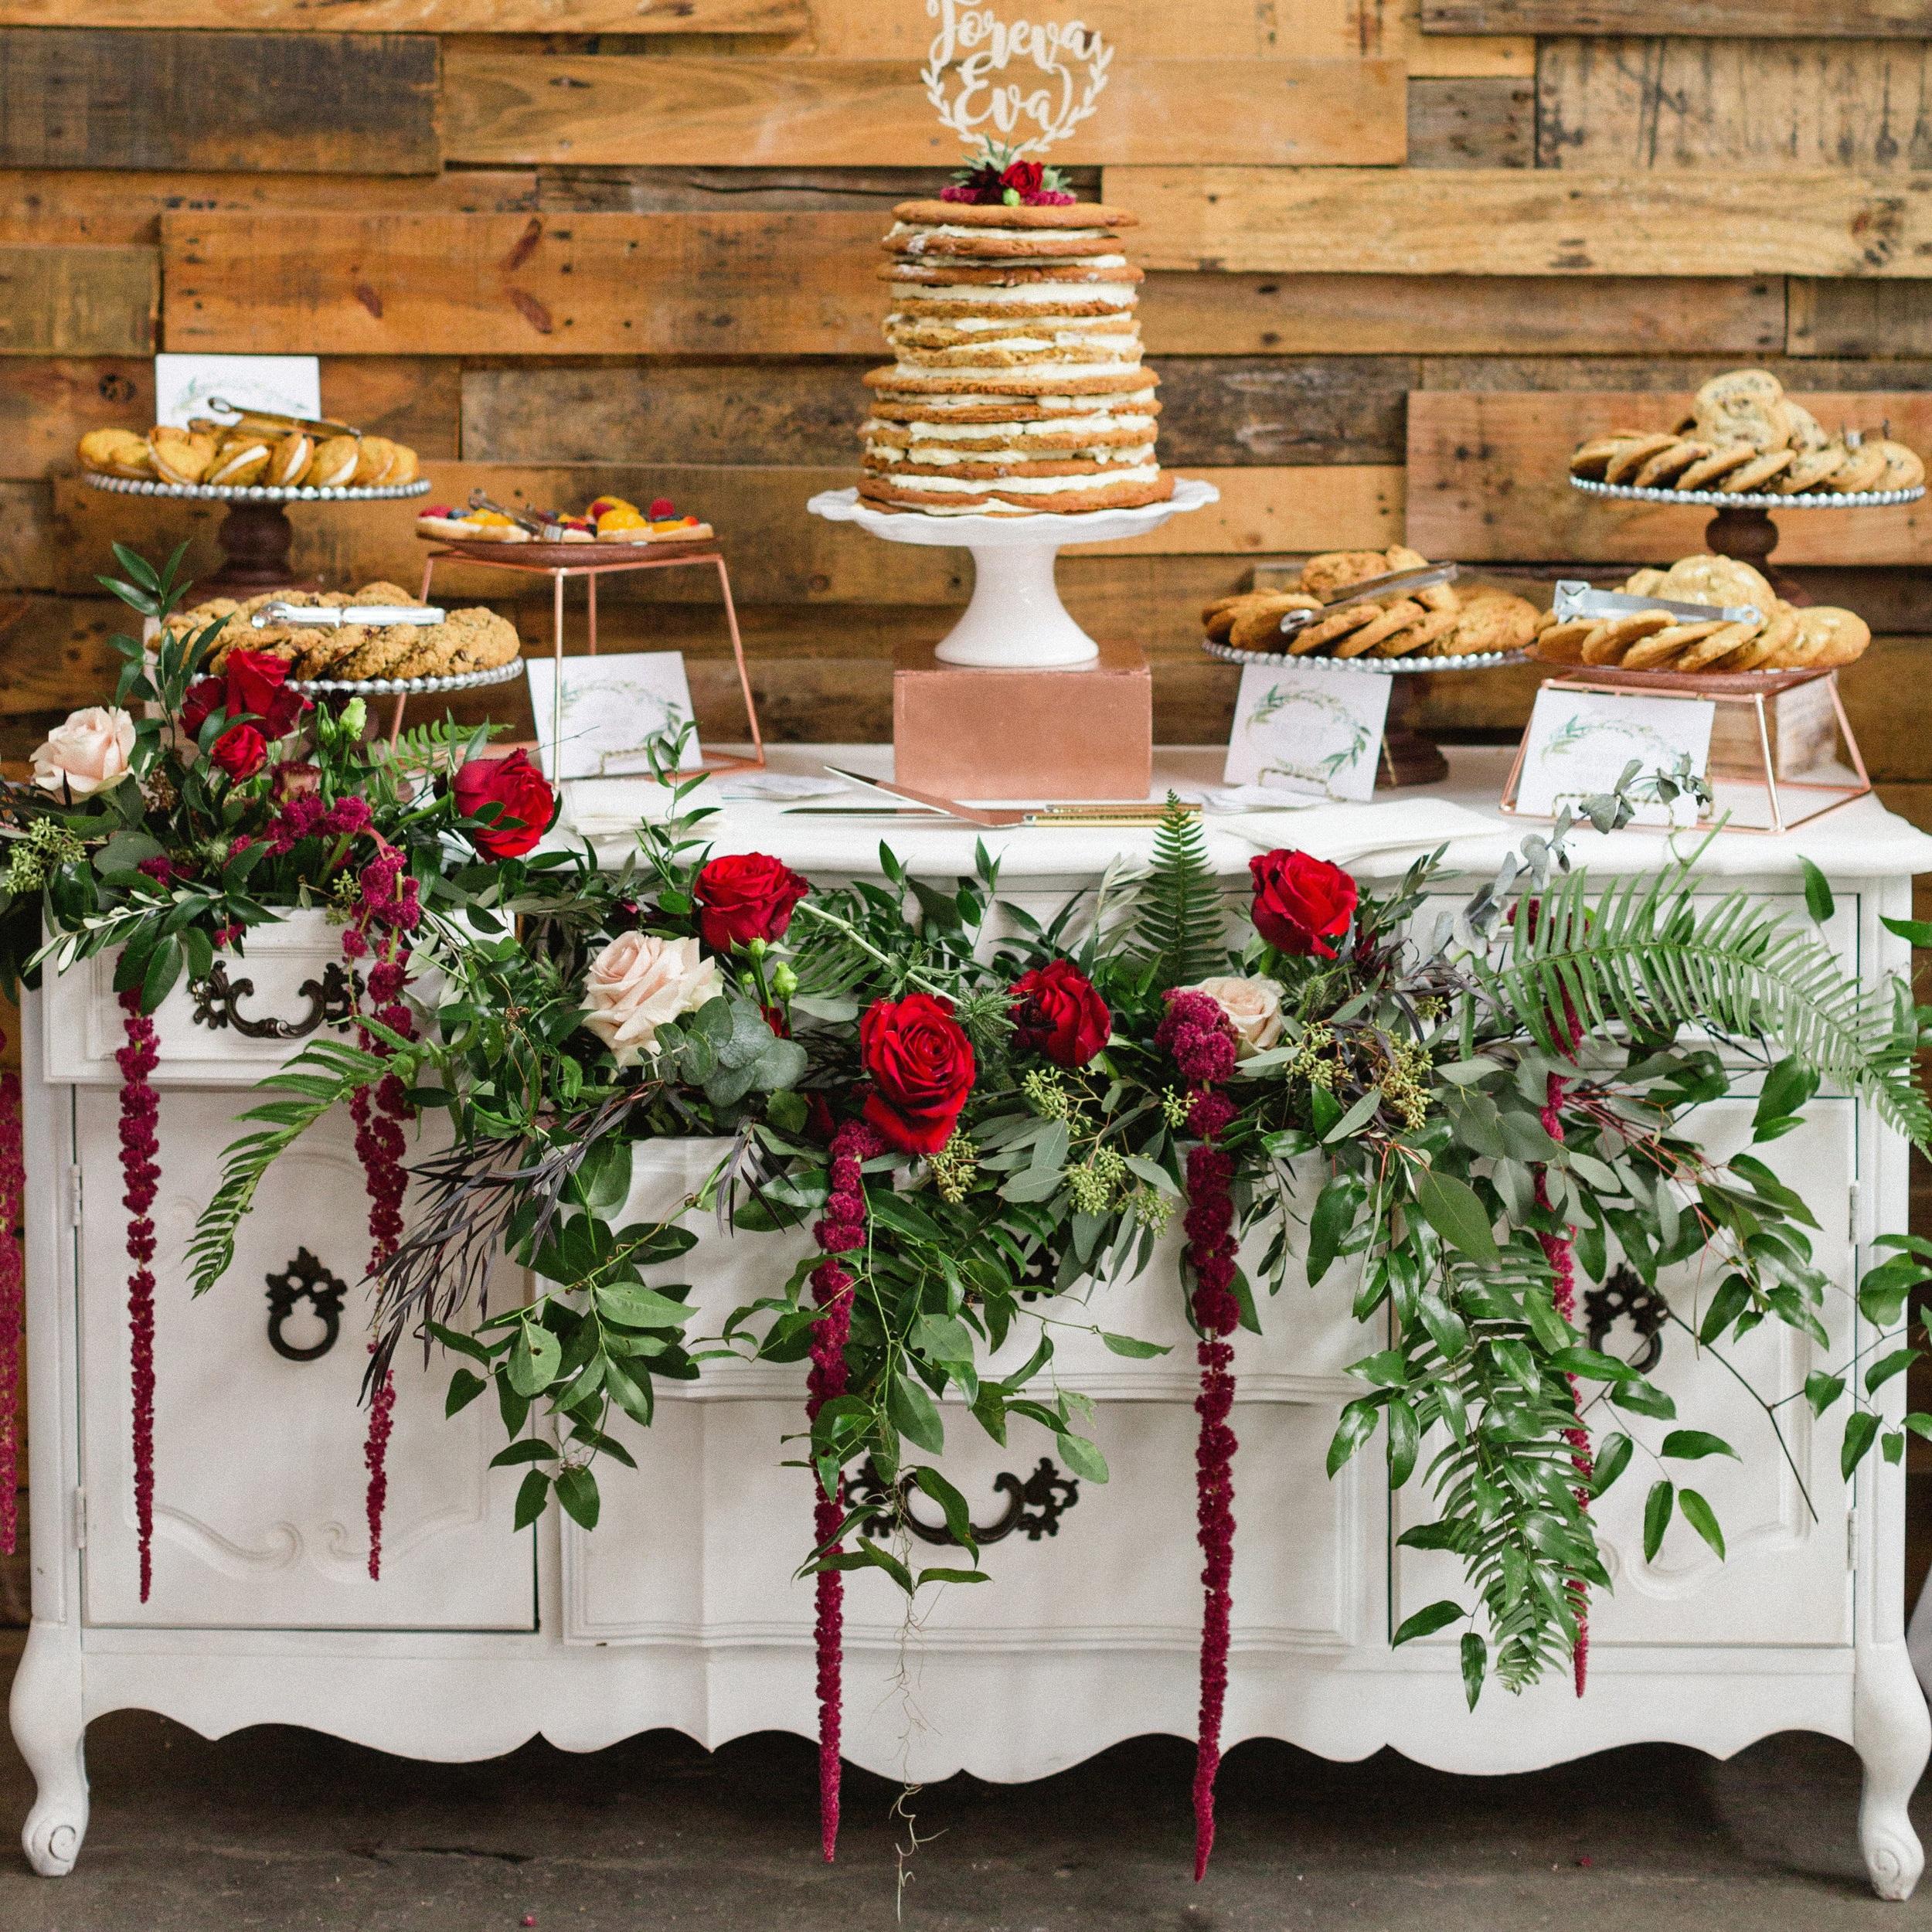 ally+%2B+blake+wedding+1190.jpg